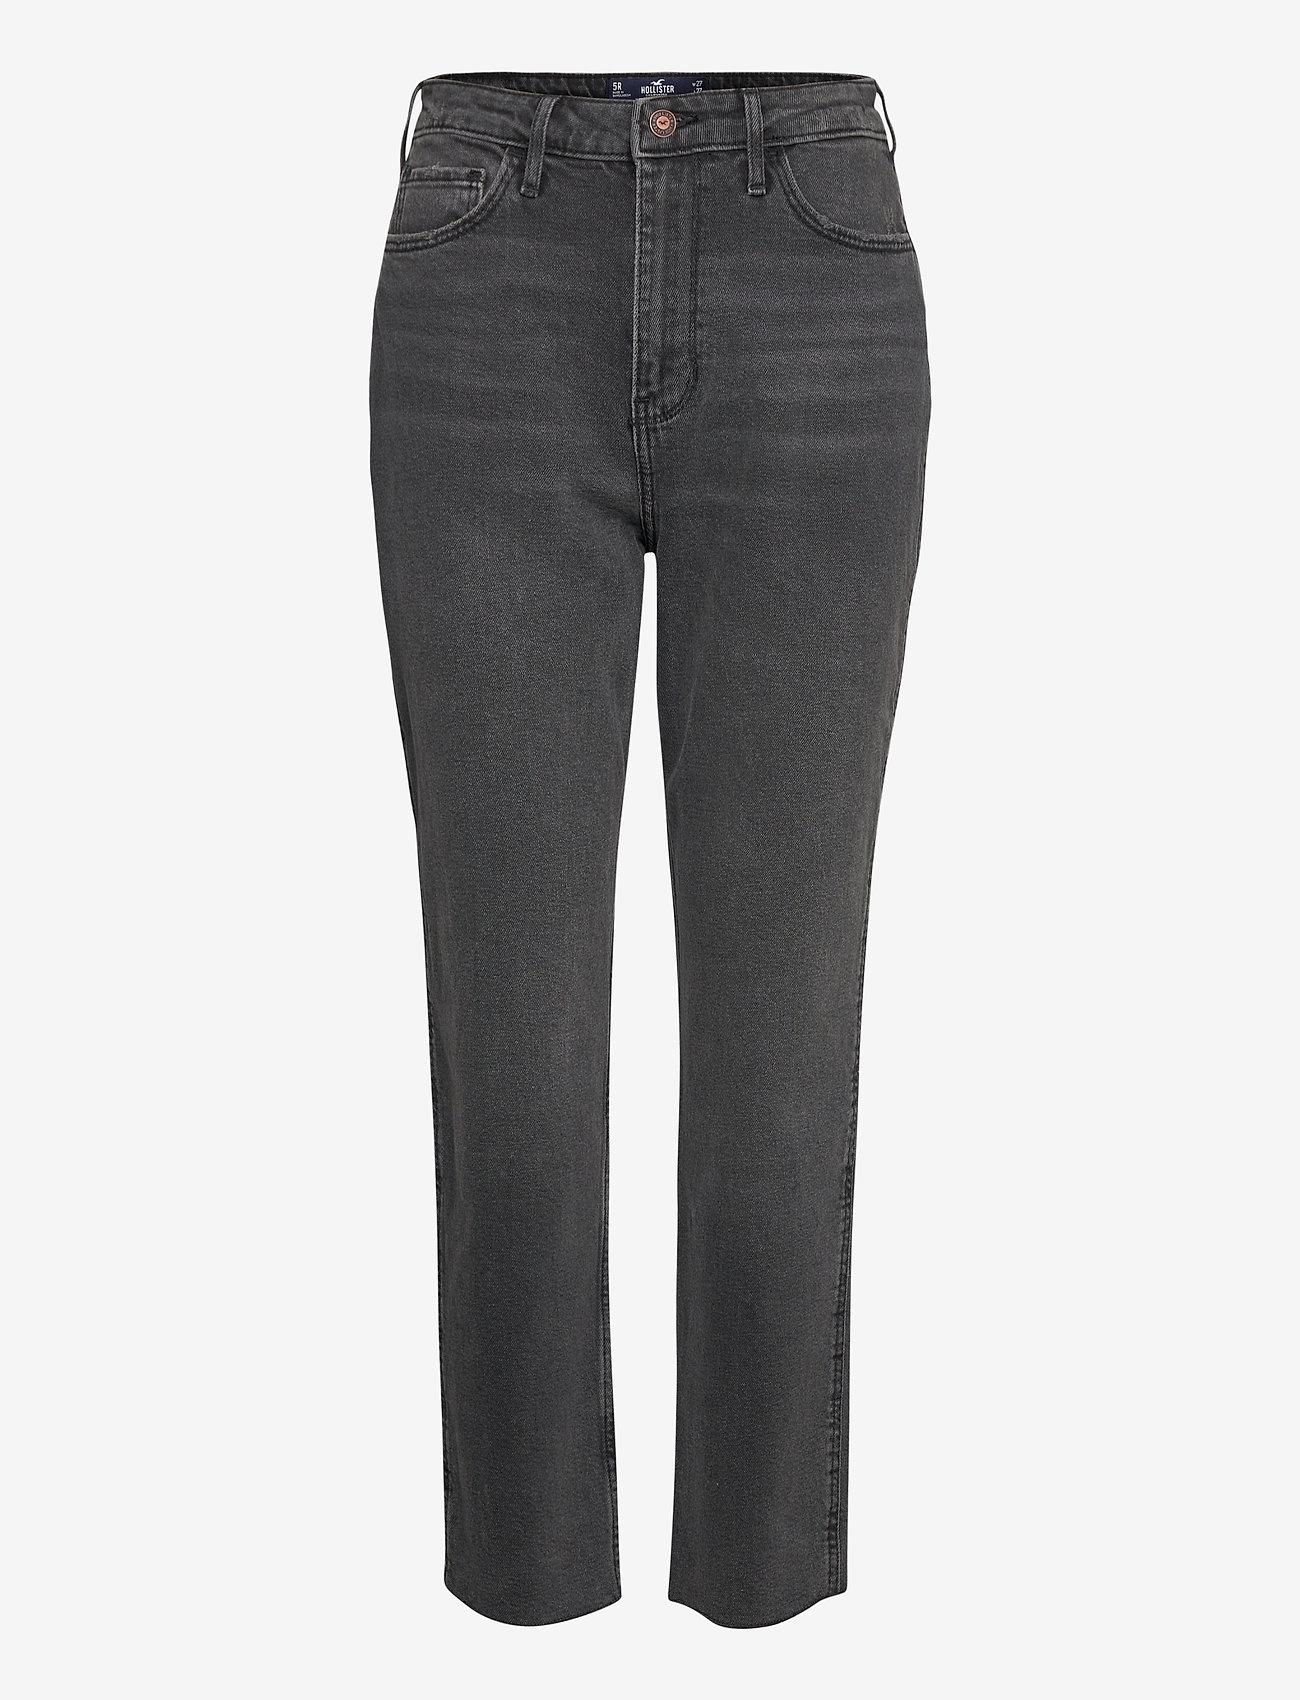 Hollister - UHR MOM - straight jeans - washed black - 0